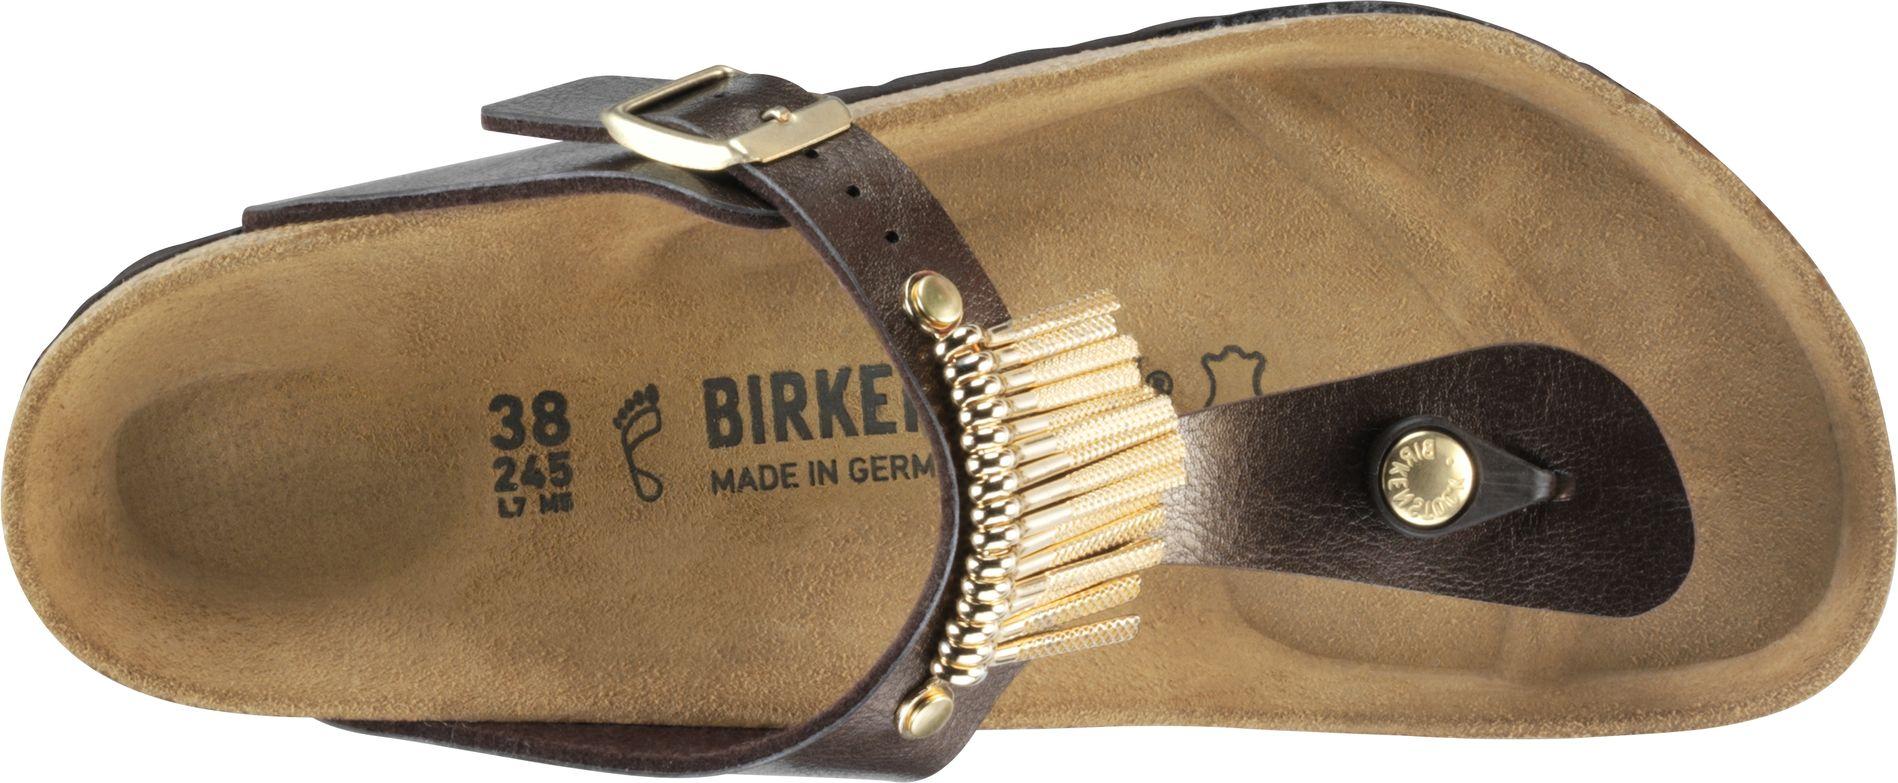 fa4375d7b1a ... Preview  Birkenstock Gizeh Fringe Graceful Toffee